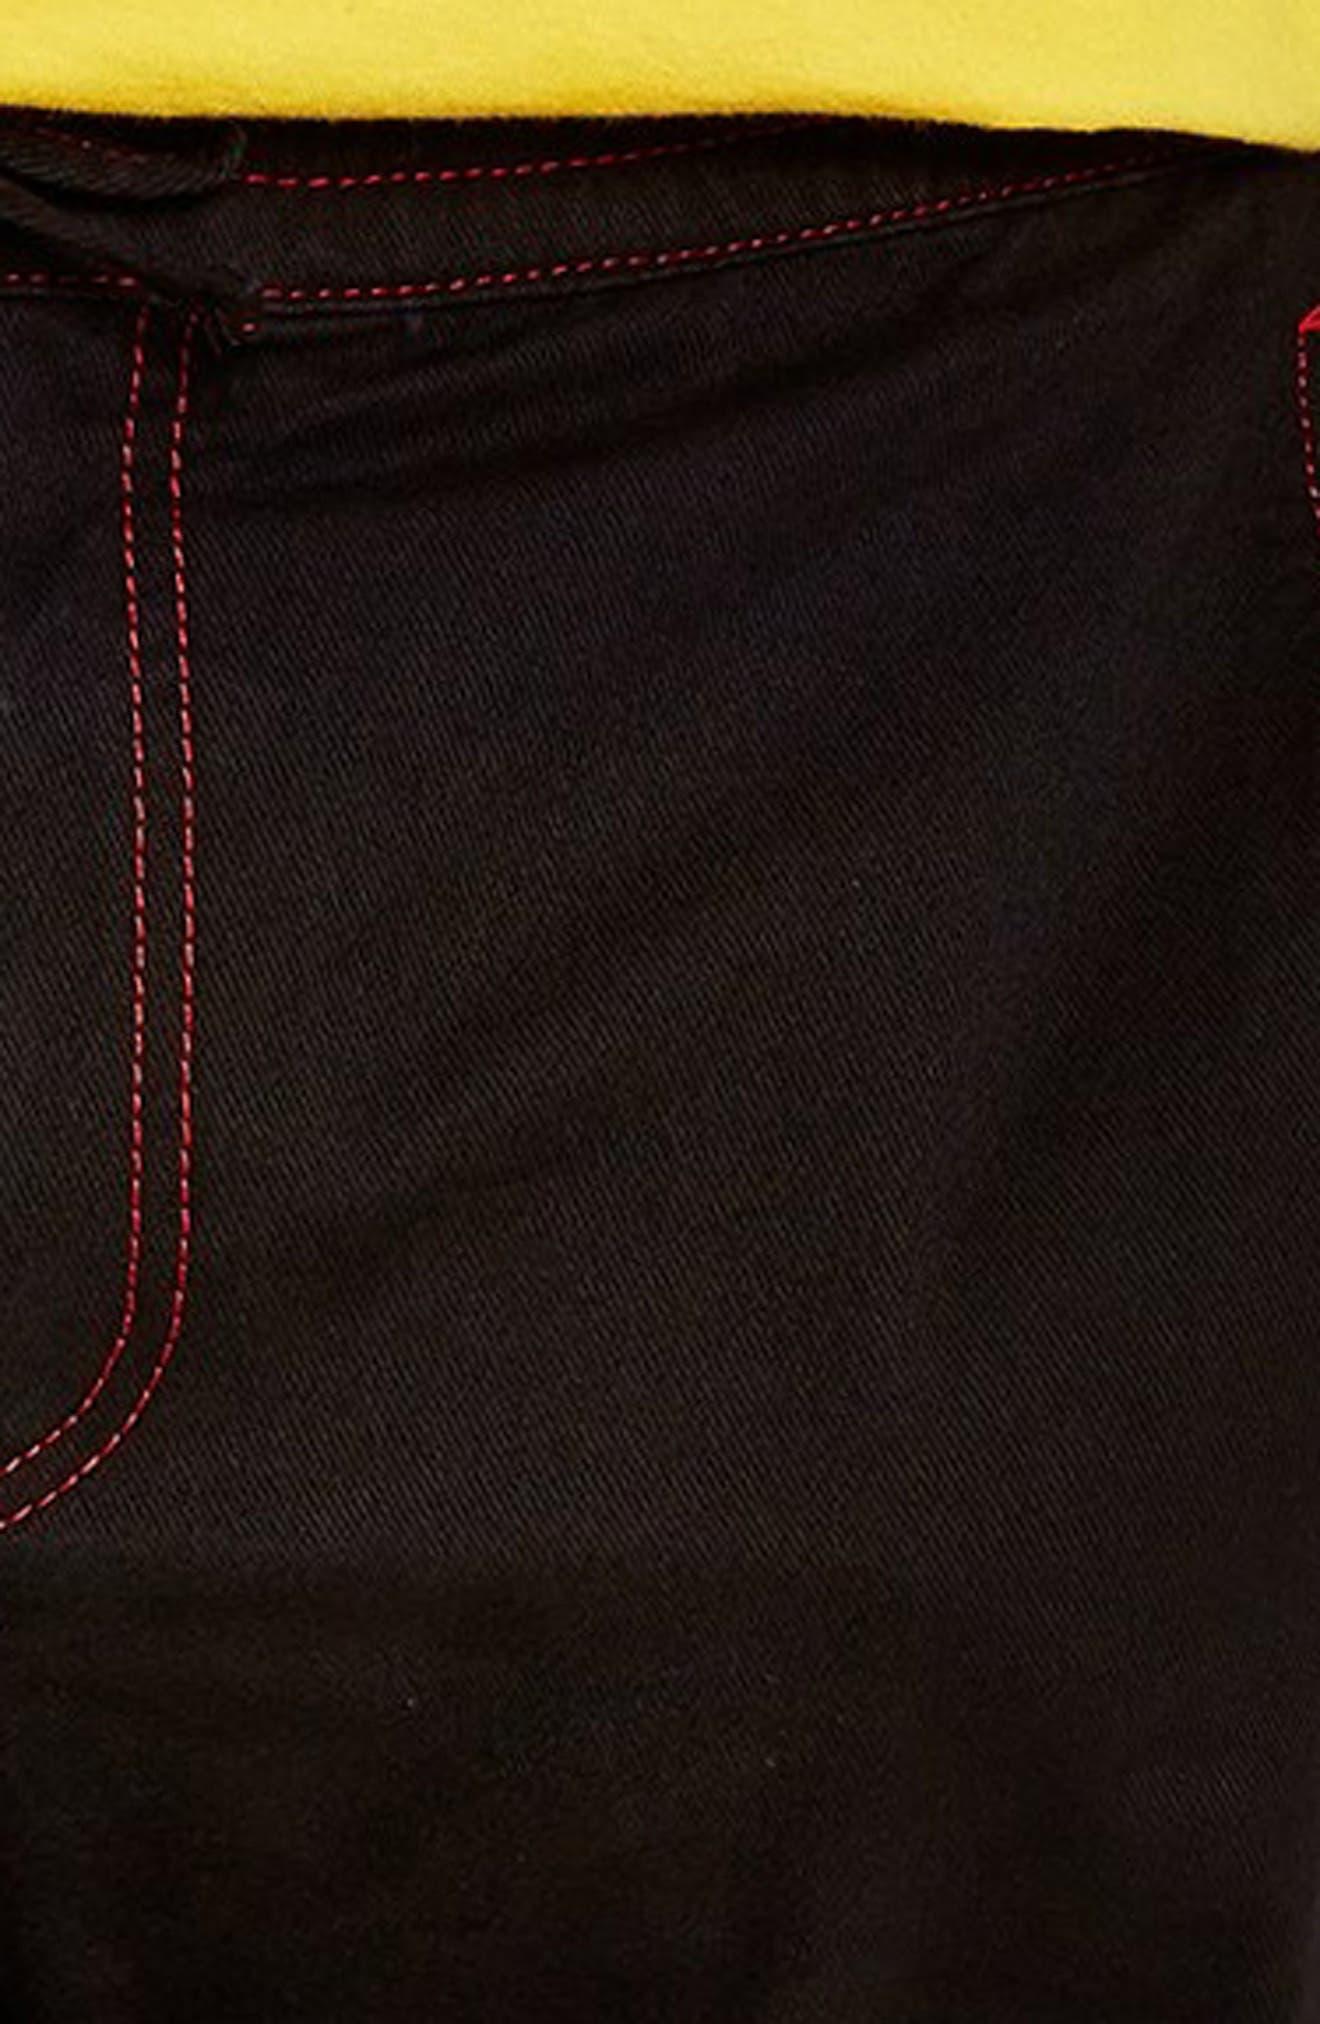 Tapered Fit Jogger Pants,                             Alternate thumbnail 3, color,                             BLACK